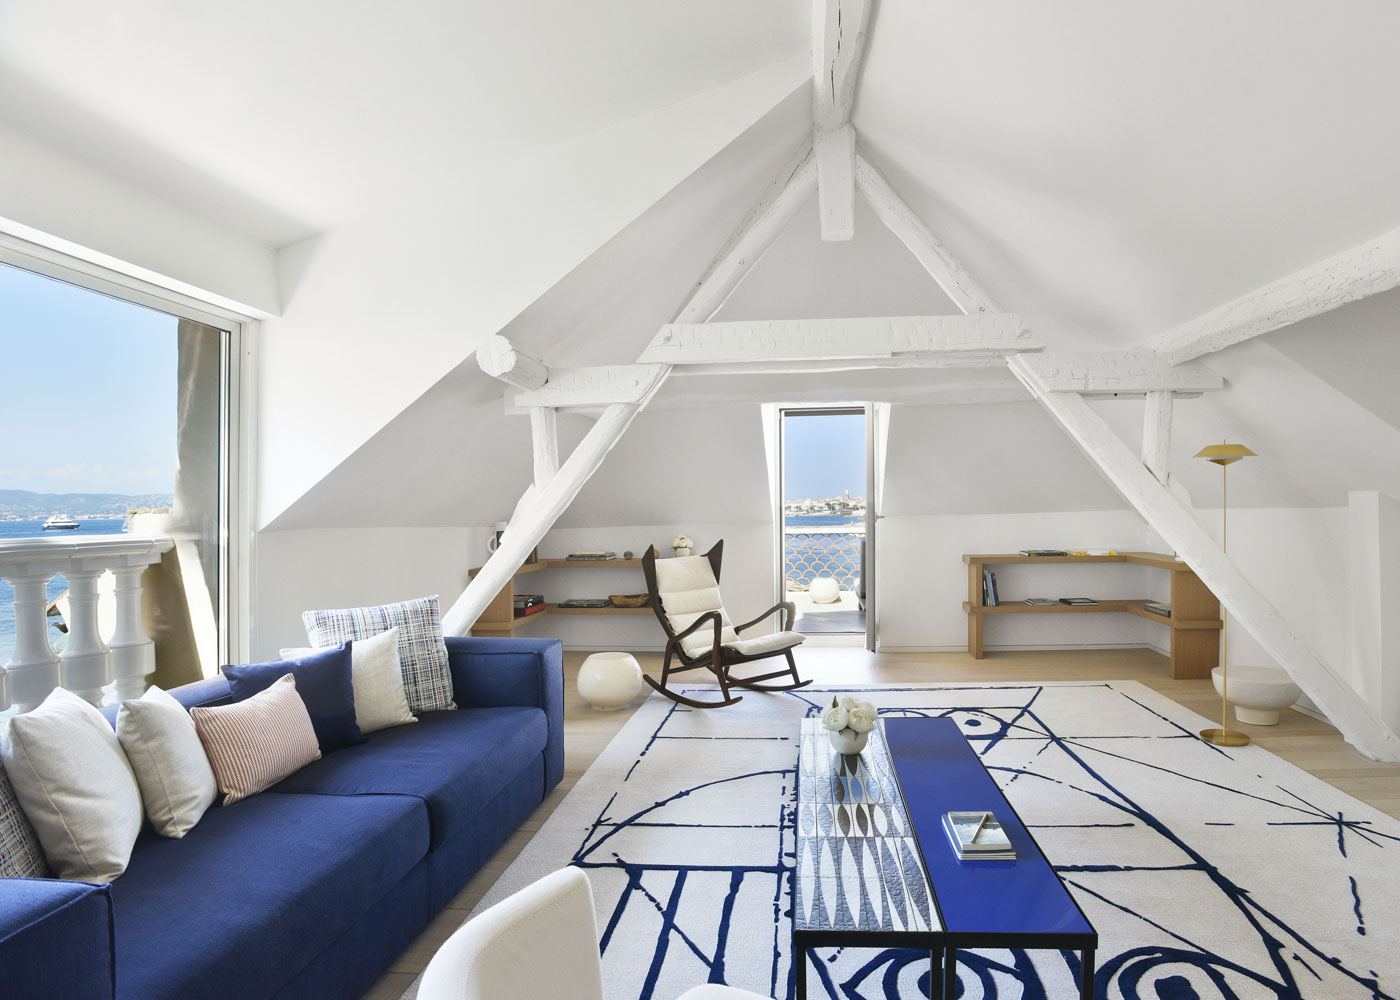 Cheval-Blanc Saint-Tropez - Duplex Pinede Suite Living Room_ V Mati